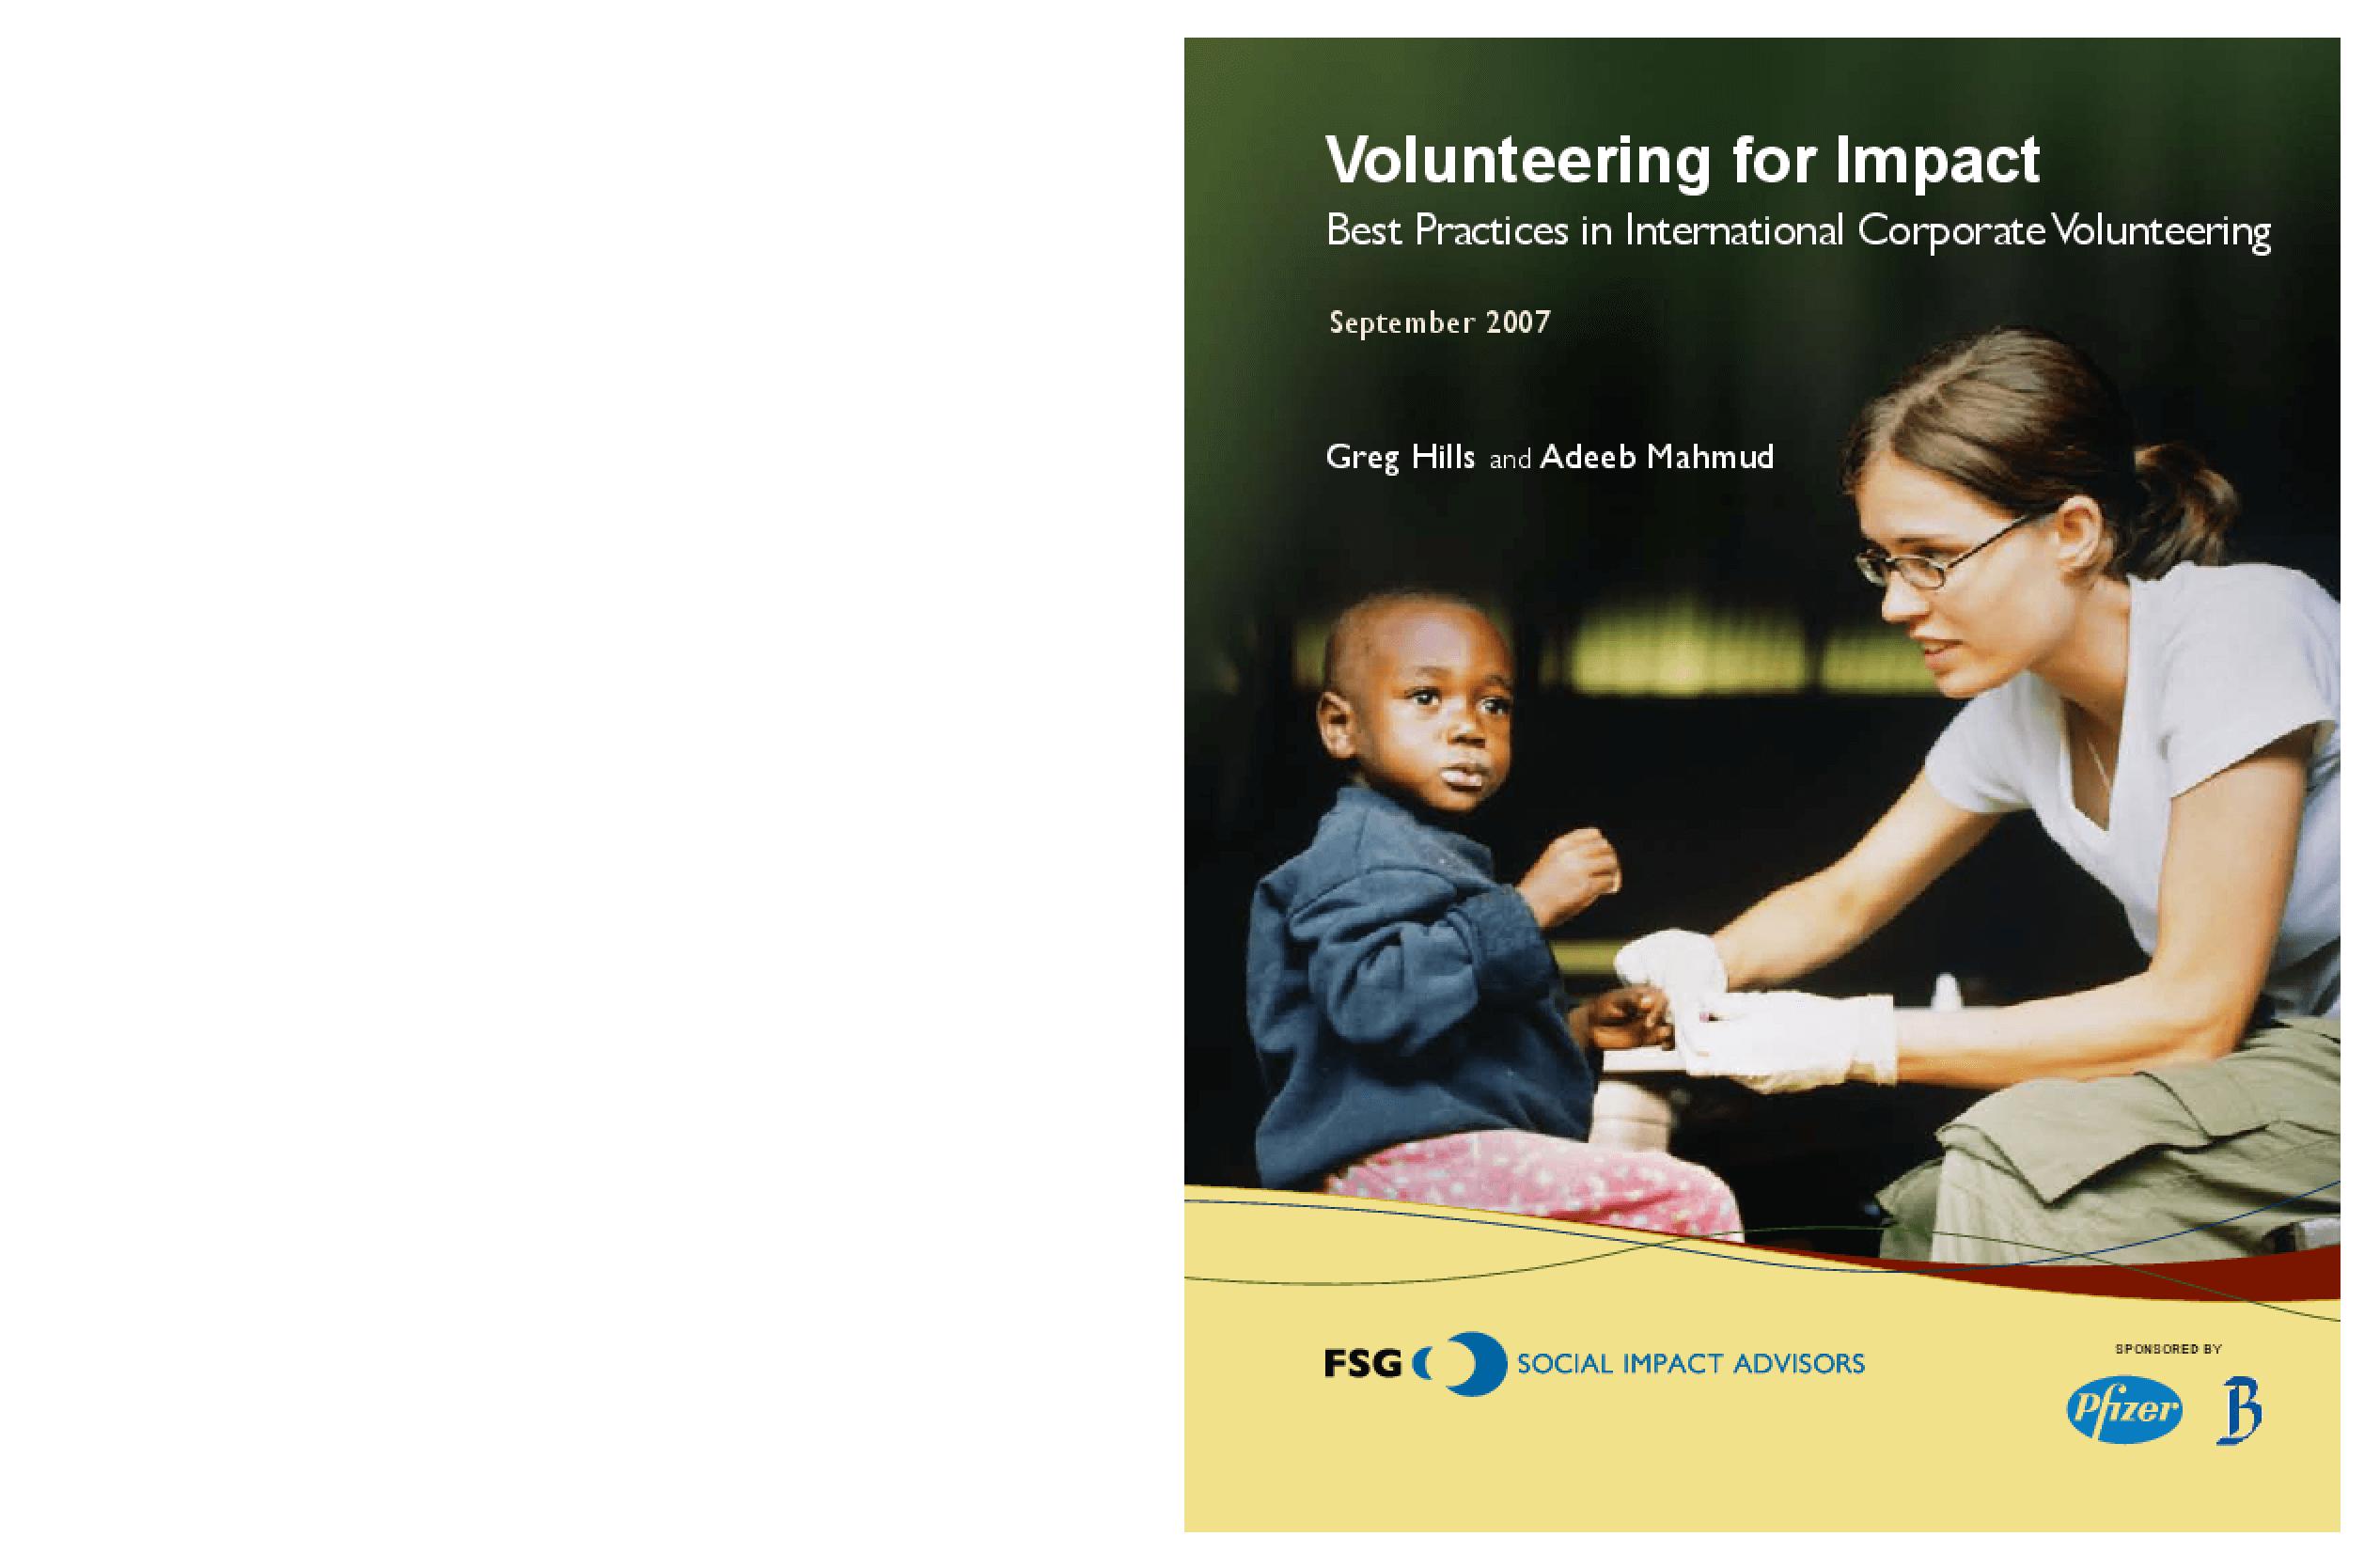 Volunteering for Impact: Best Practices in International Corporate Volunteering